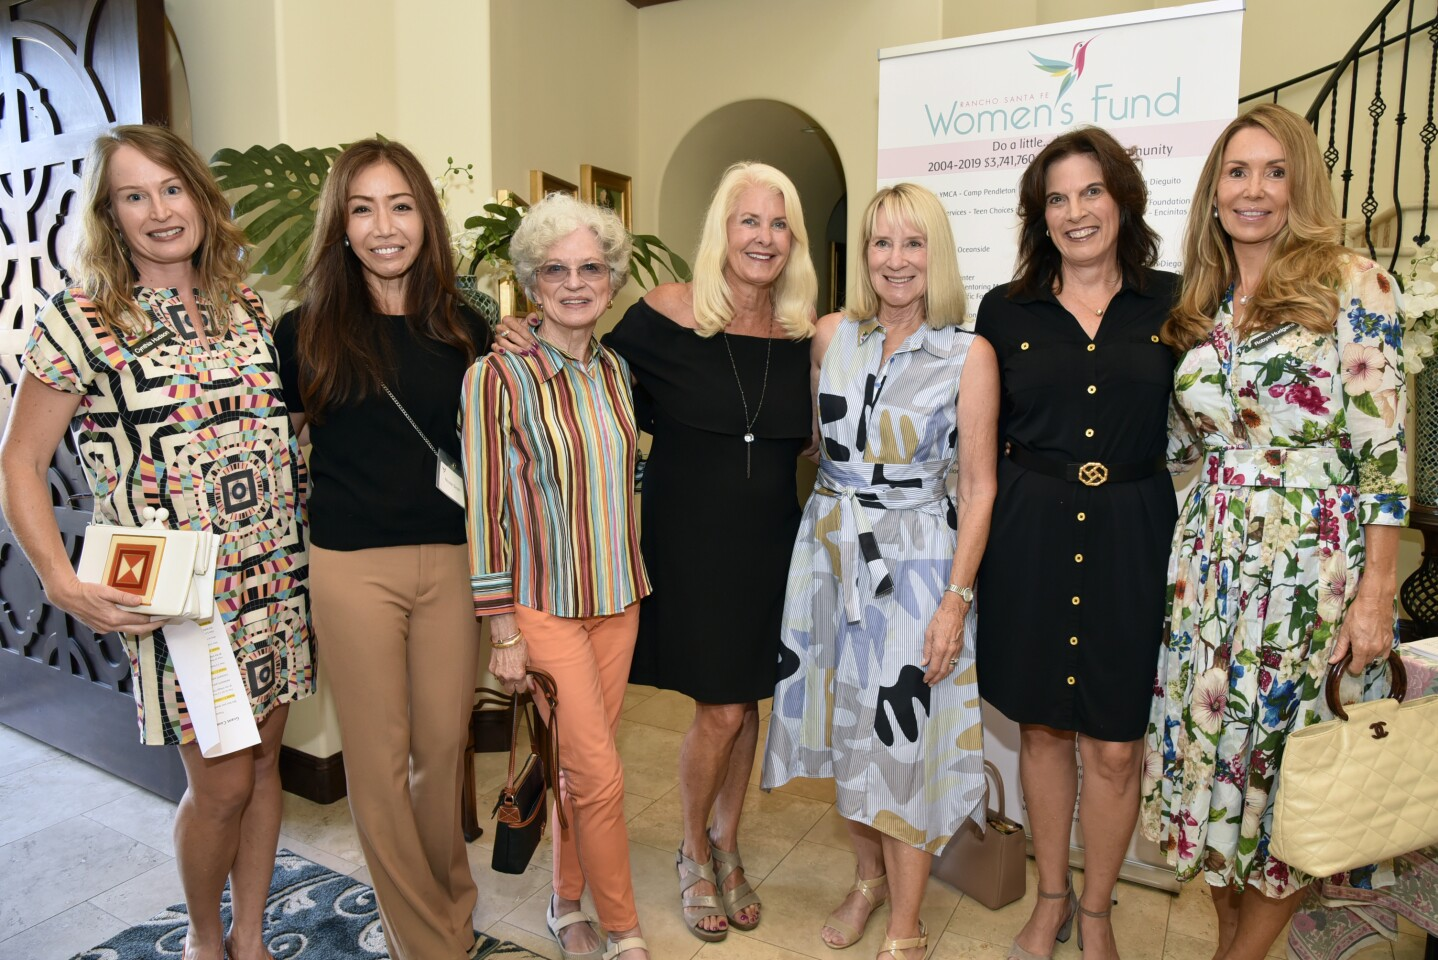 Cynthia Hudson, Nicole Smith, Gail Kendall, Deb Sims, Candace Humber, incoming Grants Chair Mara Buccholz, Past Advisory Chair Robyn Hudgens